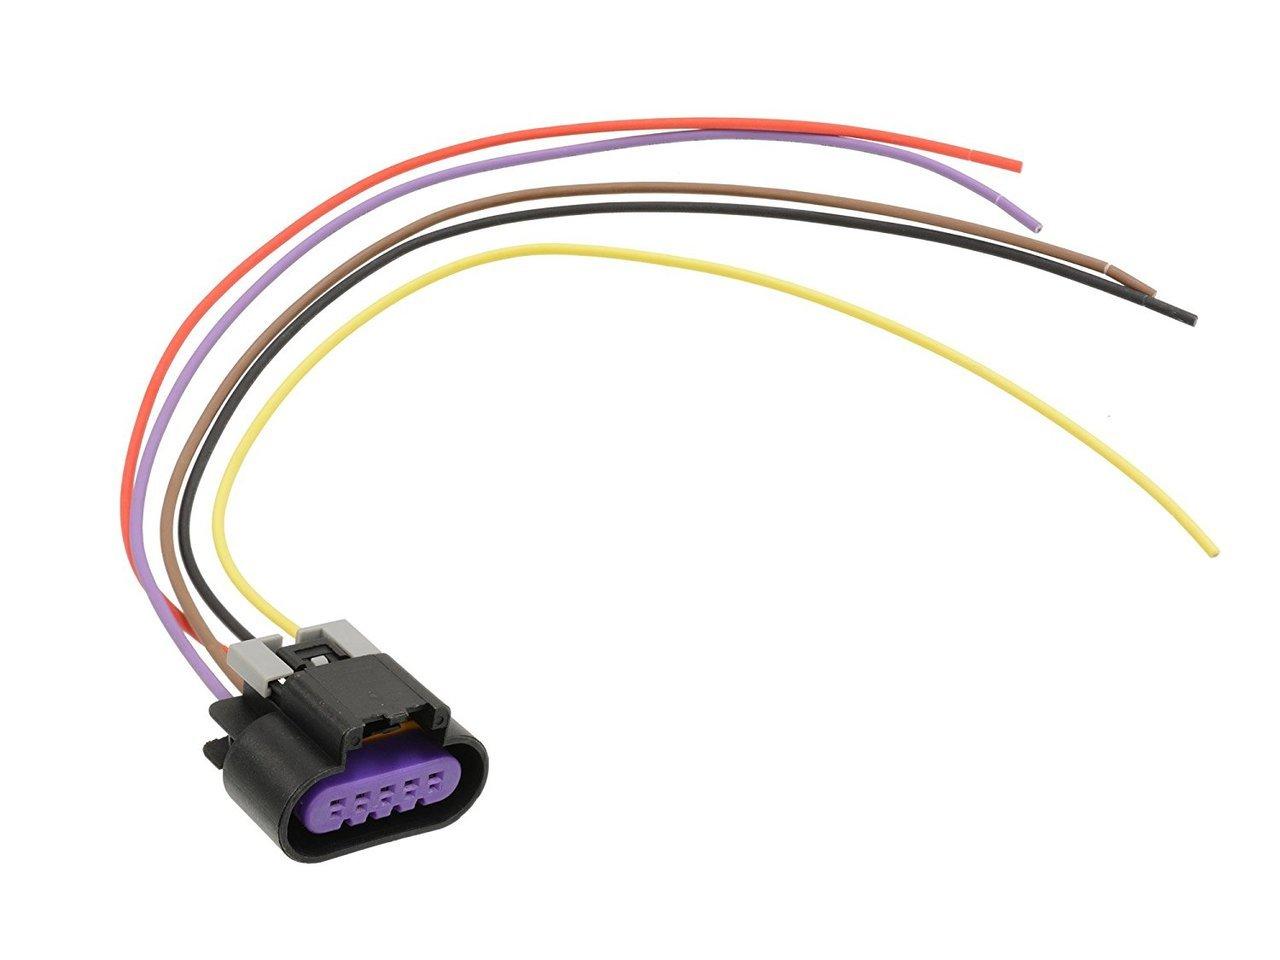 Superb 5 Wire Maf Mass Air Flow Sensor Wire Harness Gm Gmc Cadillac Hummer Chevy Buick Saab Saturn Wiring Cloud Picalendutblikvittorg